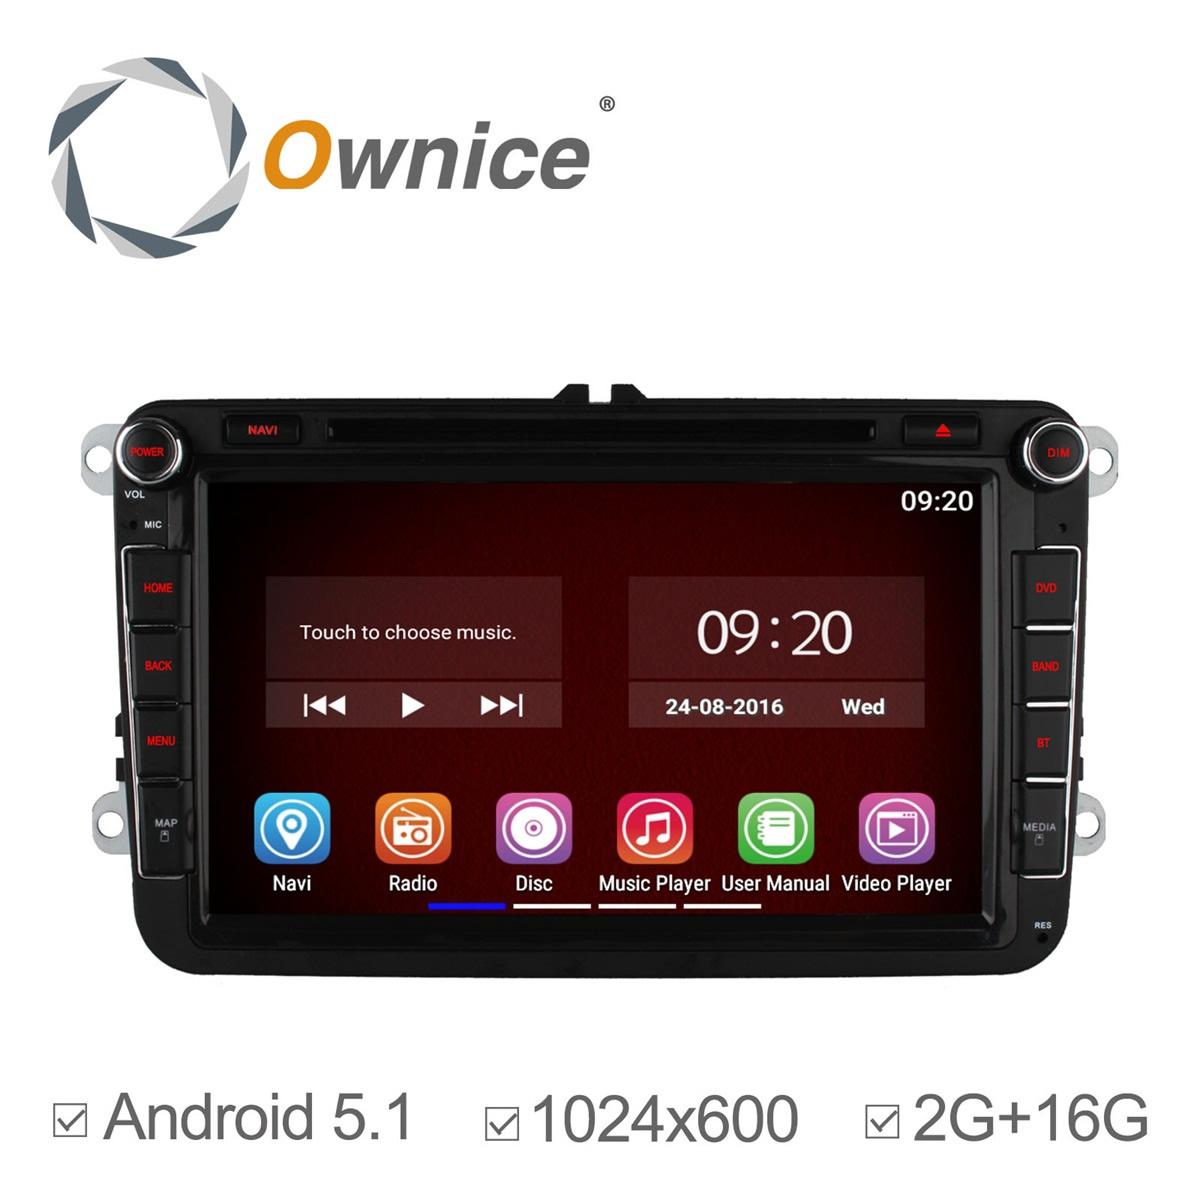 Ownice Pure Android 5.1 Quad Core Car DVD GPS for VW Jetta Polo Tiguan Golf Passat B5 B6 Volkswagen Radio Bluetooth 2G/16GB(China (Mainland))